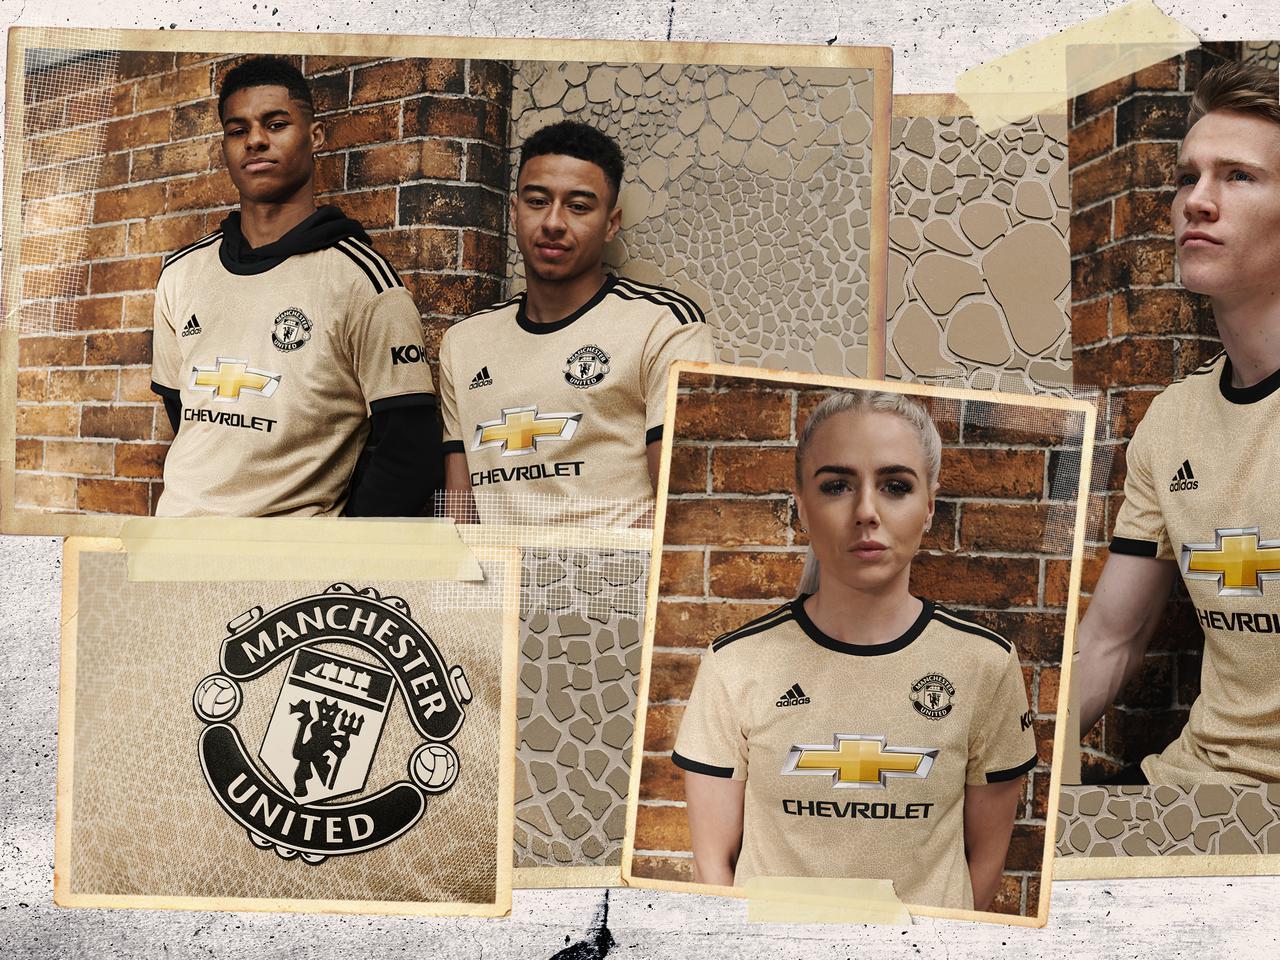 Adidas Reveals Man Utd Third Kit For 2019 20 Season Manchester United